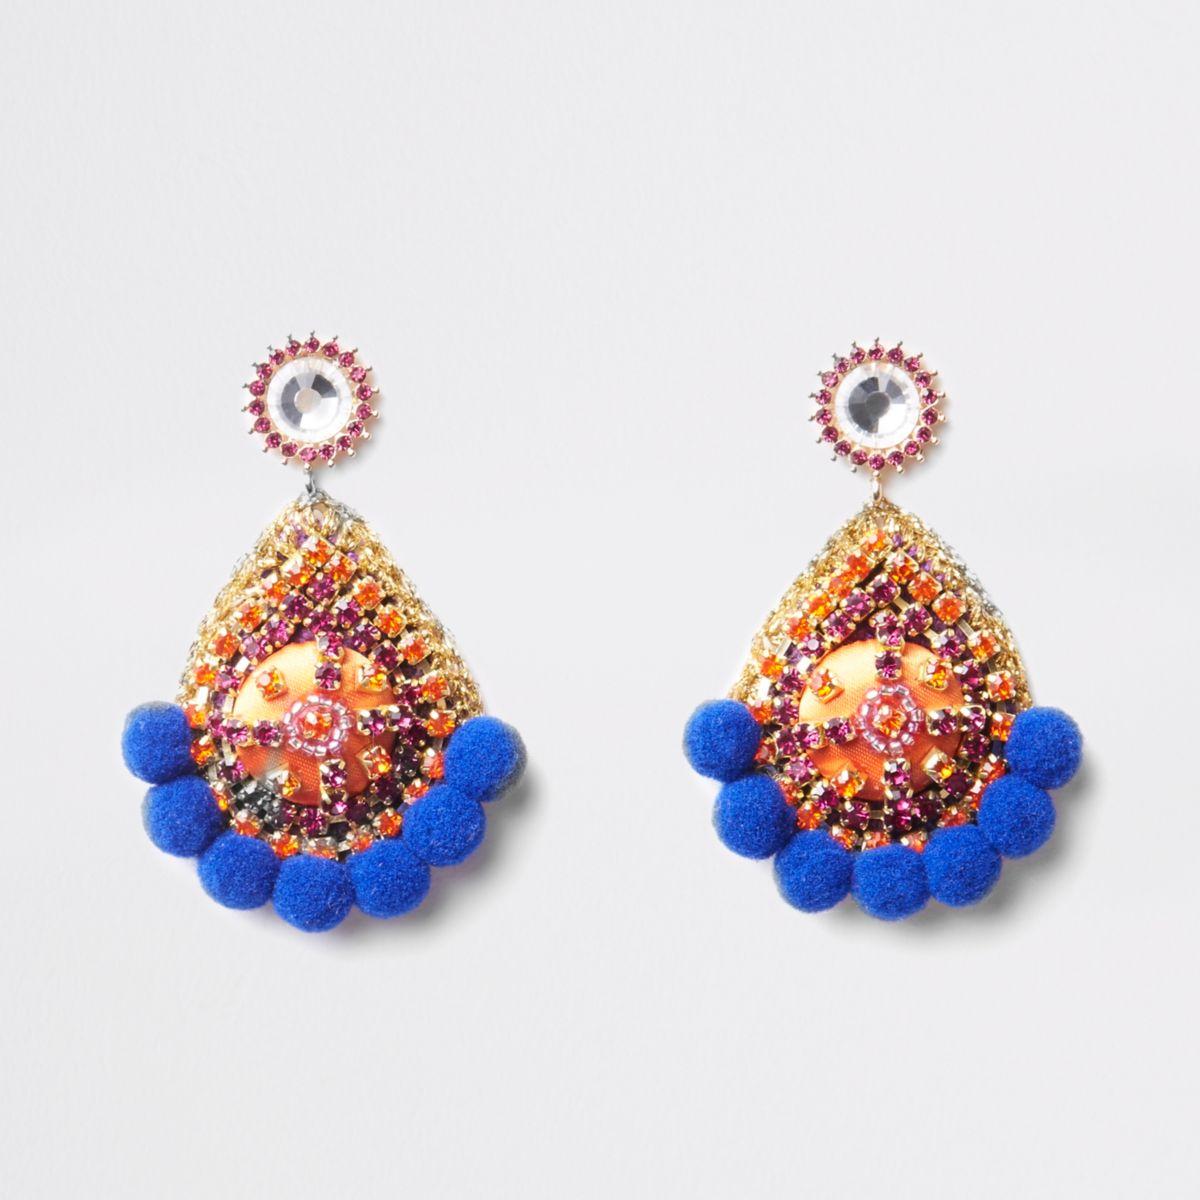 Blue pom pom diamante stud earrings